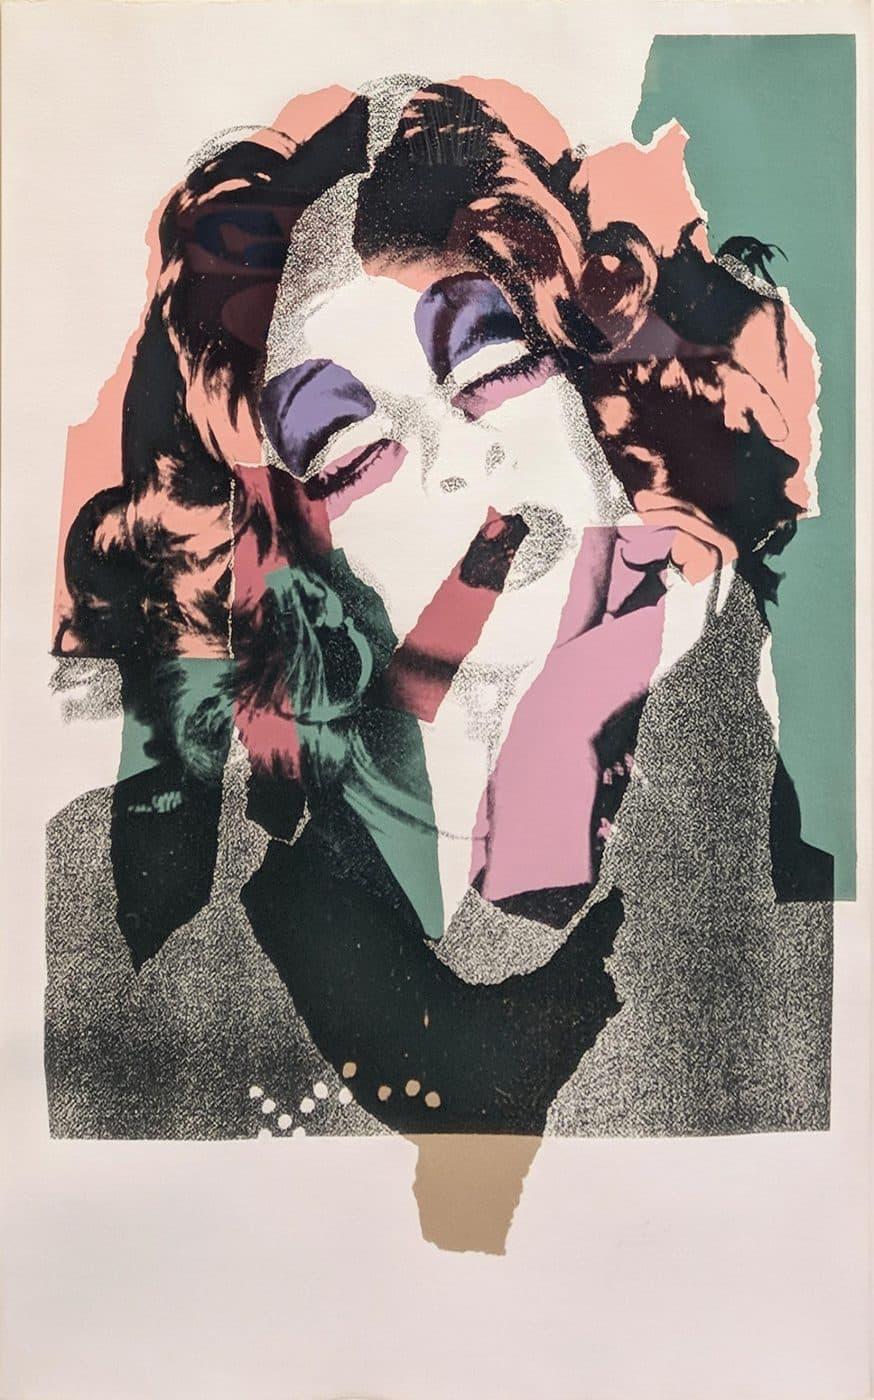 Ladies and Gentlemen (FS II.128), 1975, by Andy Warhol